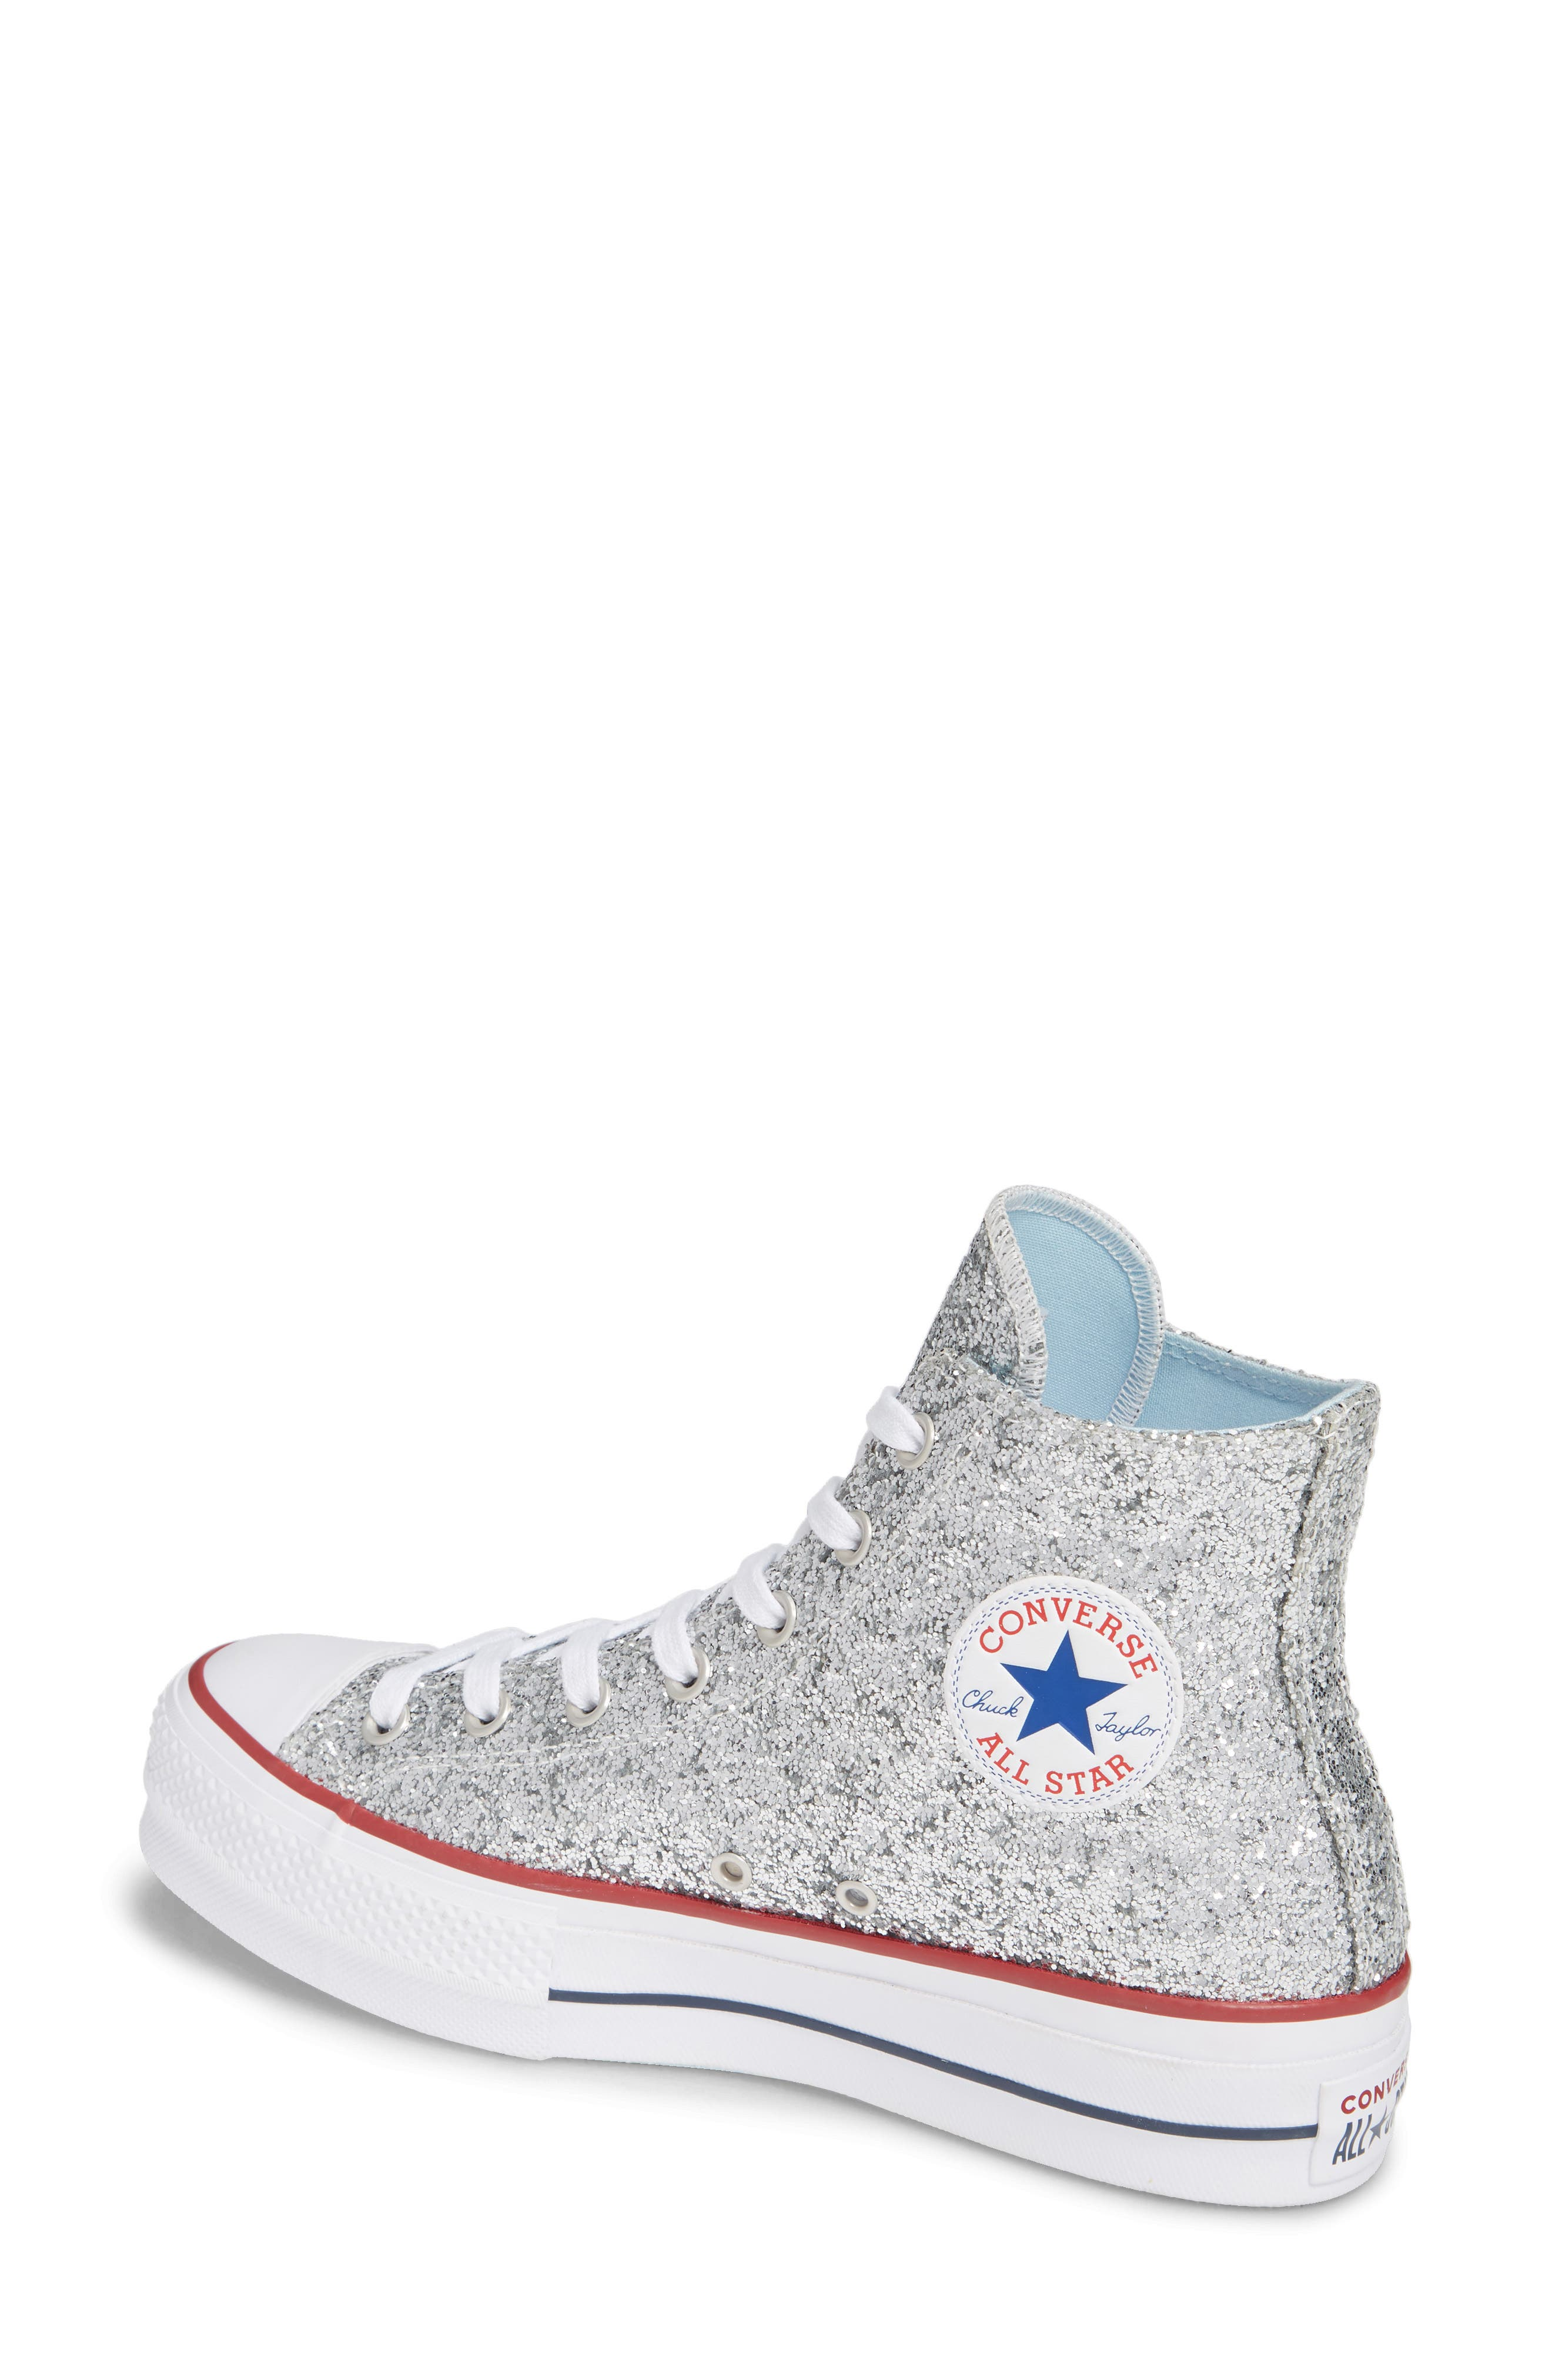 CONVERSE,                             x Chiara Ferragni 70 Hi One Star Glitter Platform Sneaker,                             Alternate thumbnail 2, color,                             040